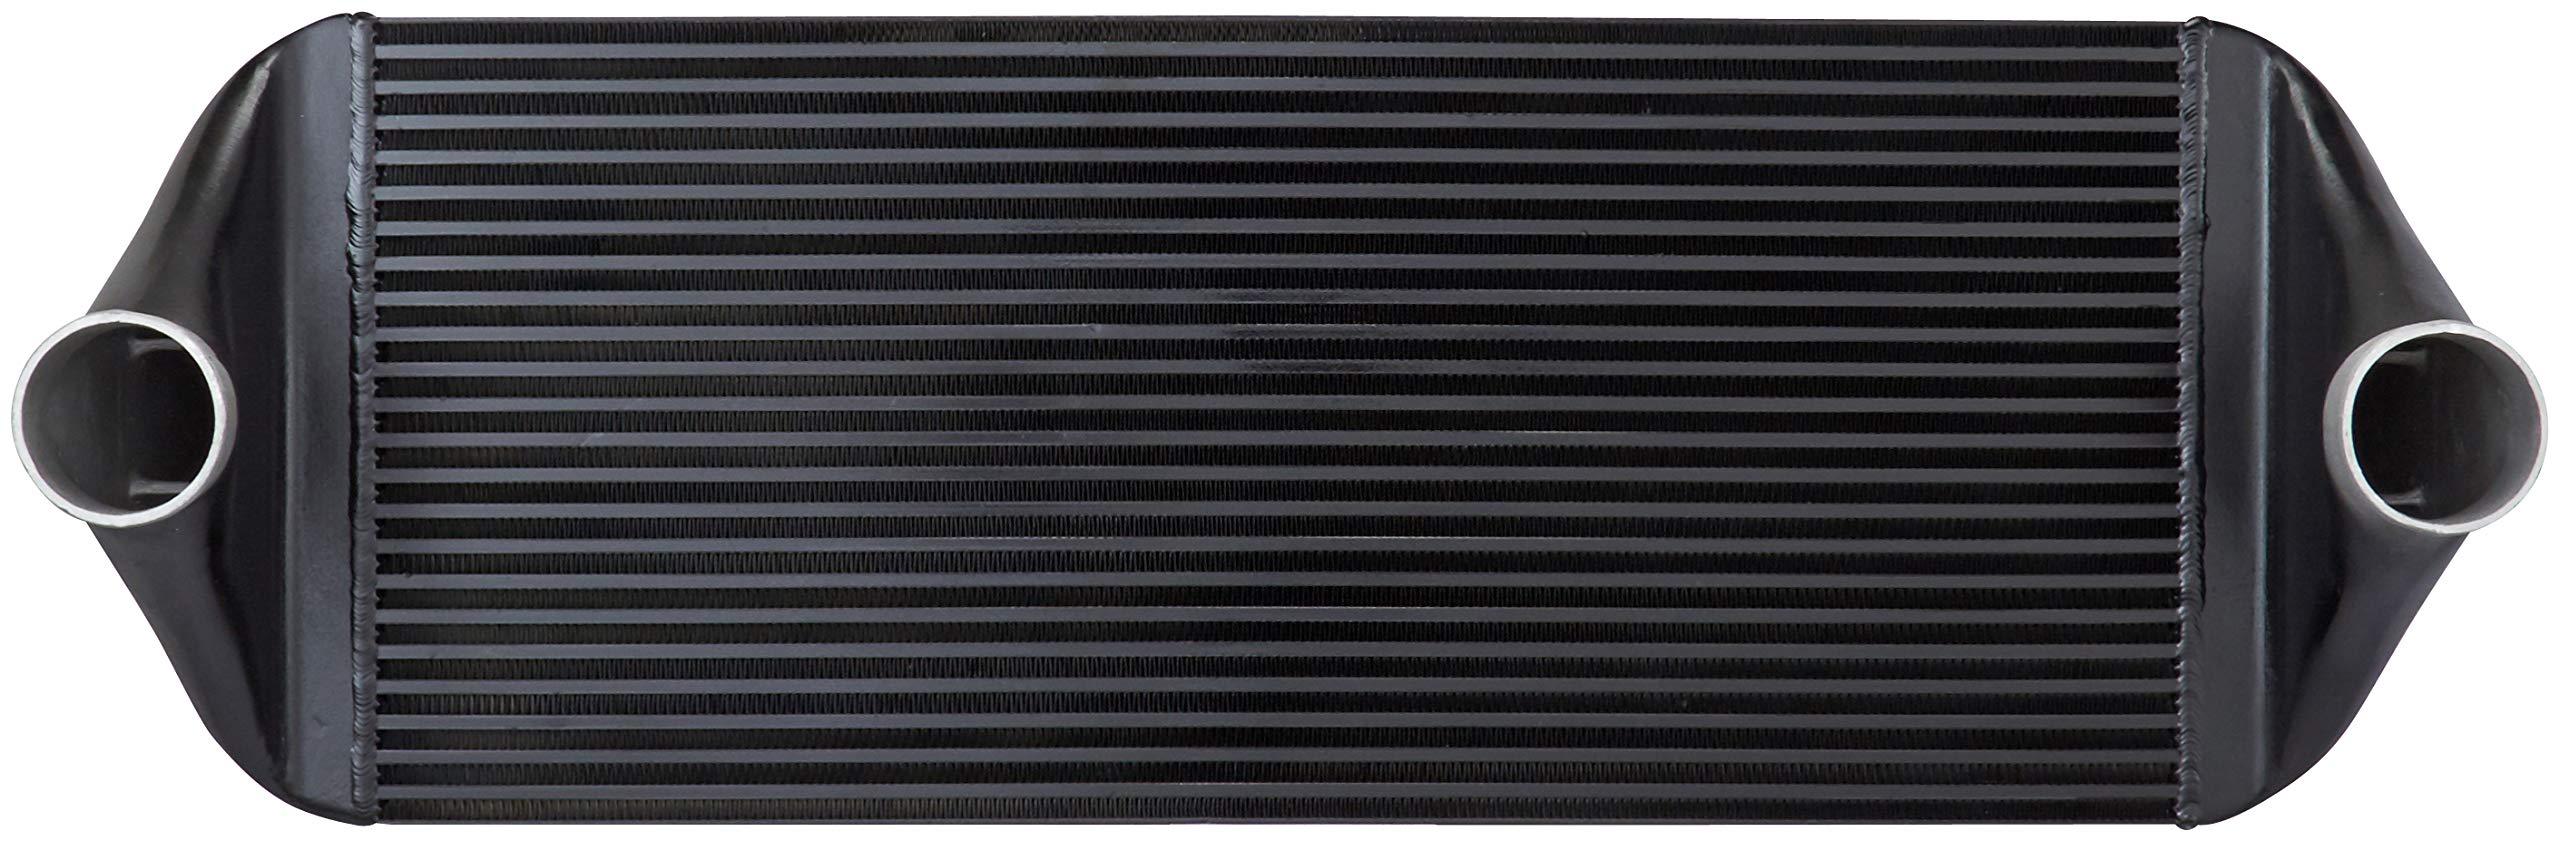 Spectra Premium 4401-3811 Turbocharger Intercooler by Spectra Premium